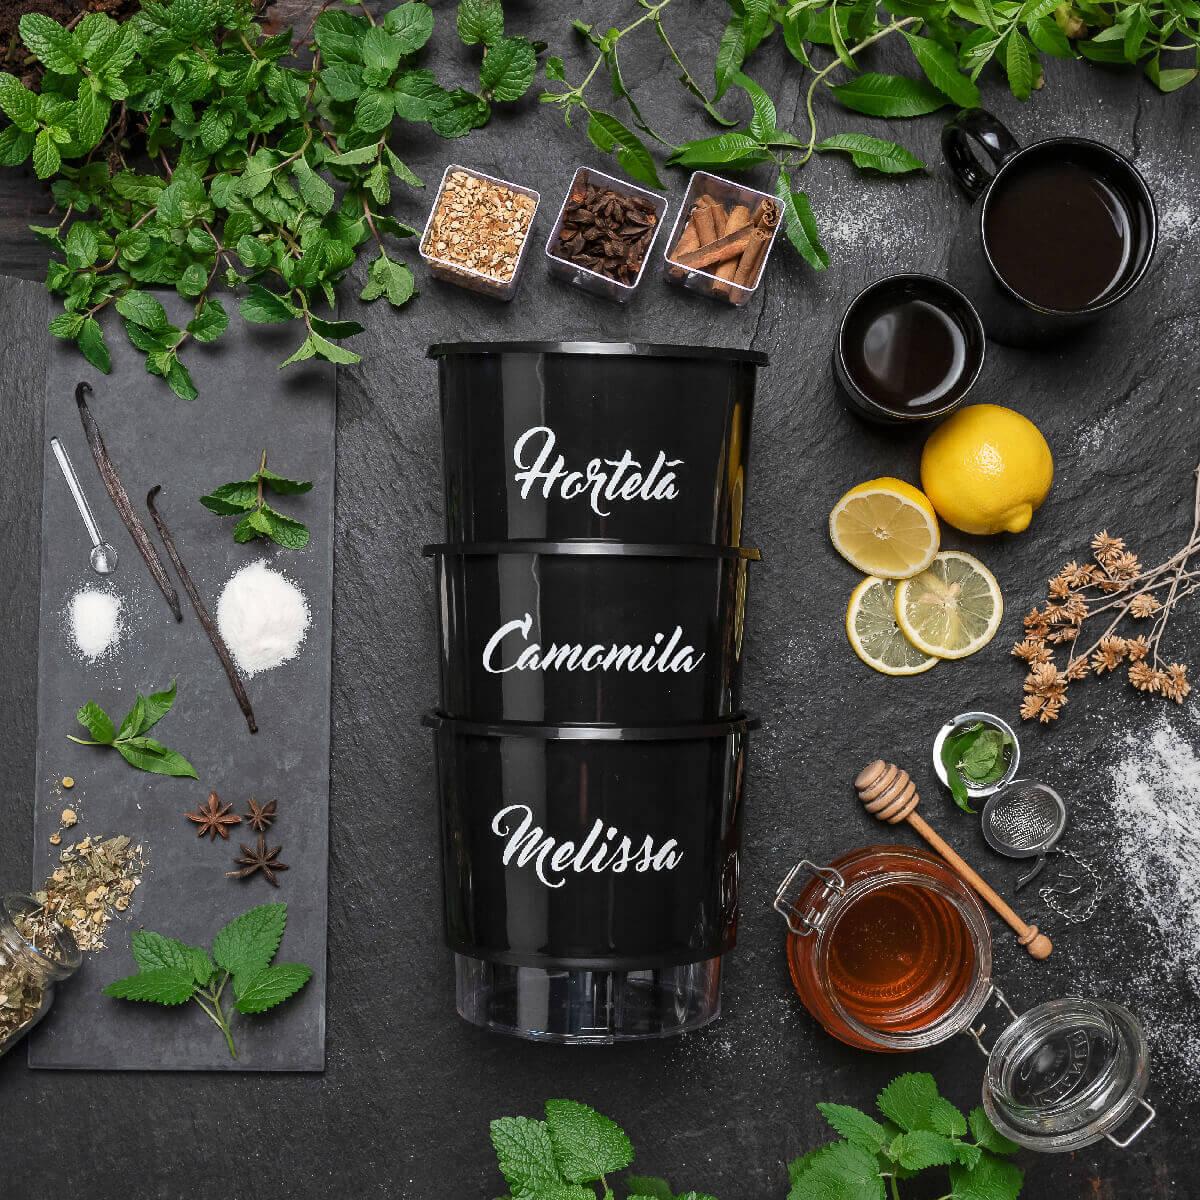 Kit Plantio Completo Gourmet Chás  - Loja Raiz